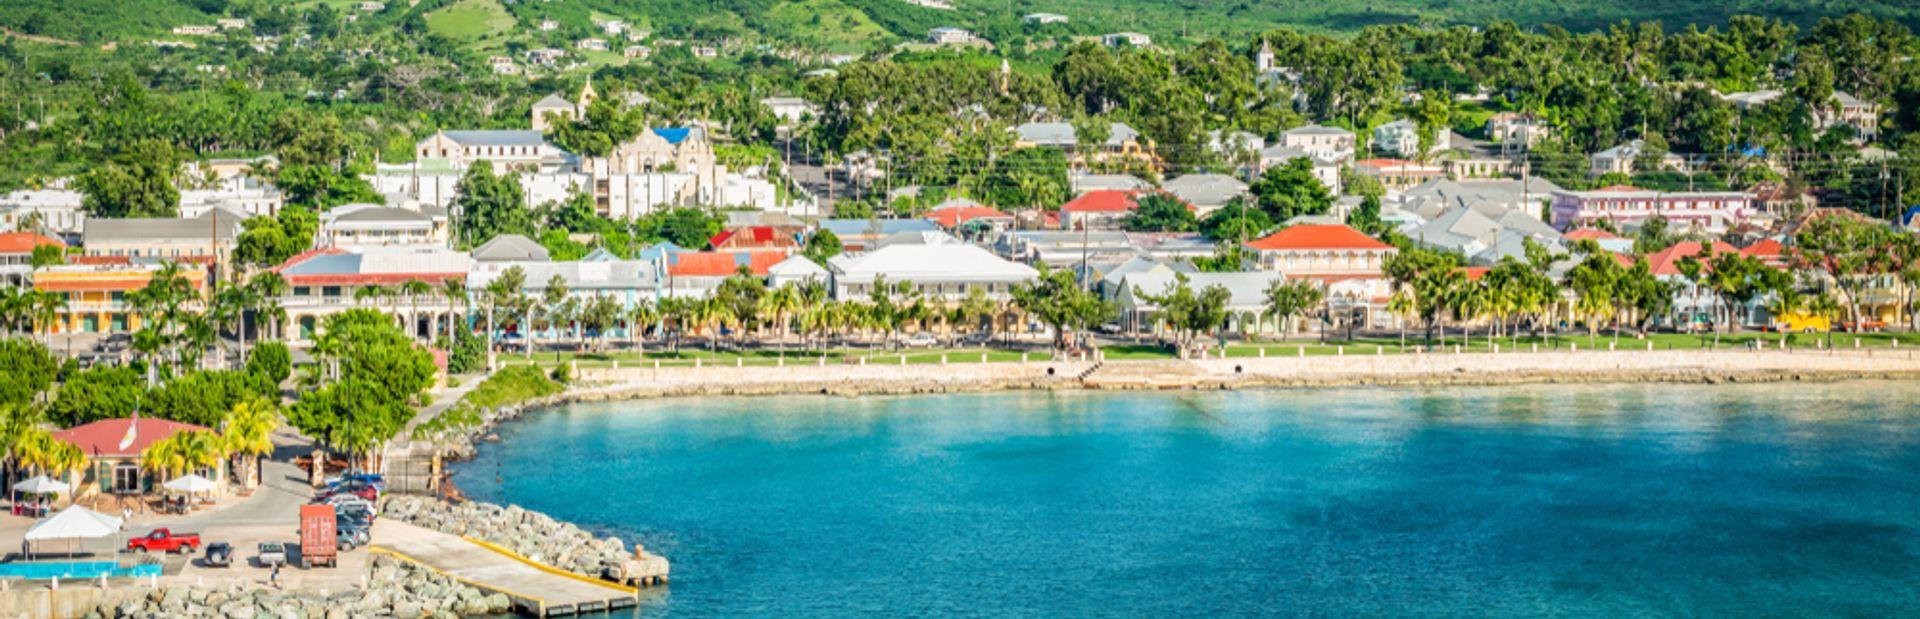 St Croix guide